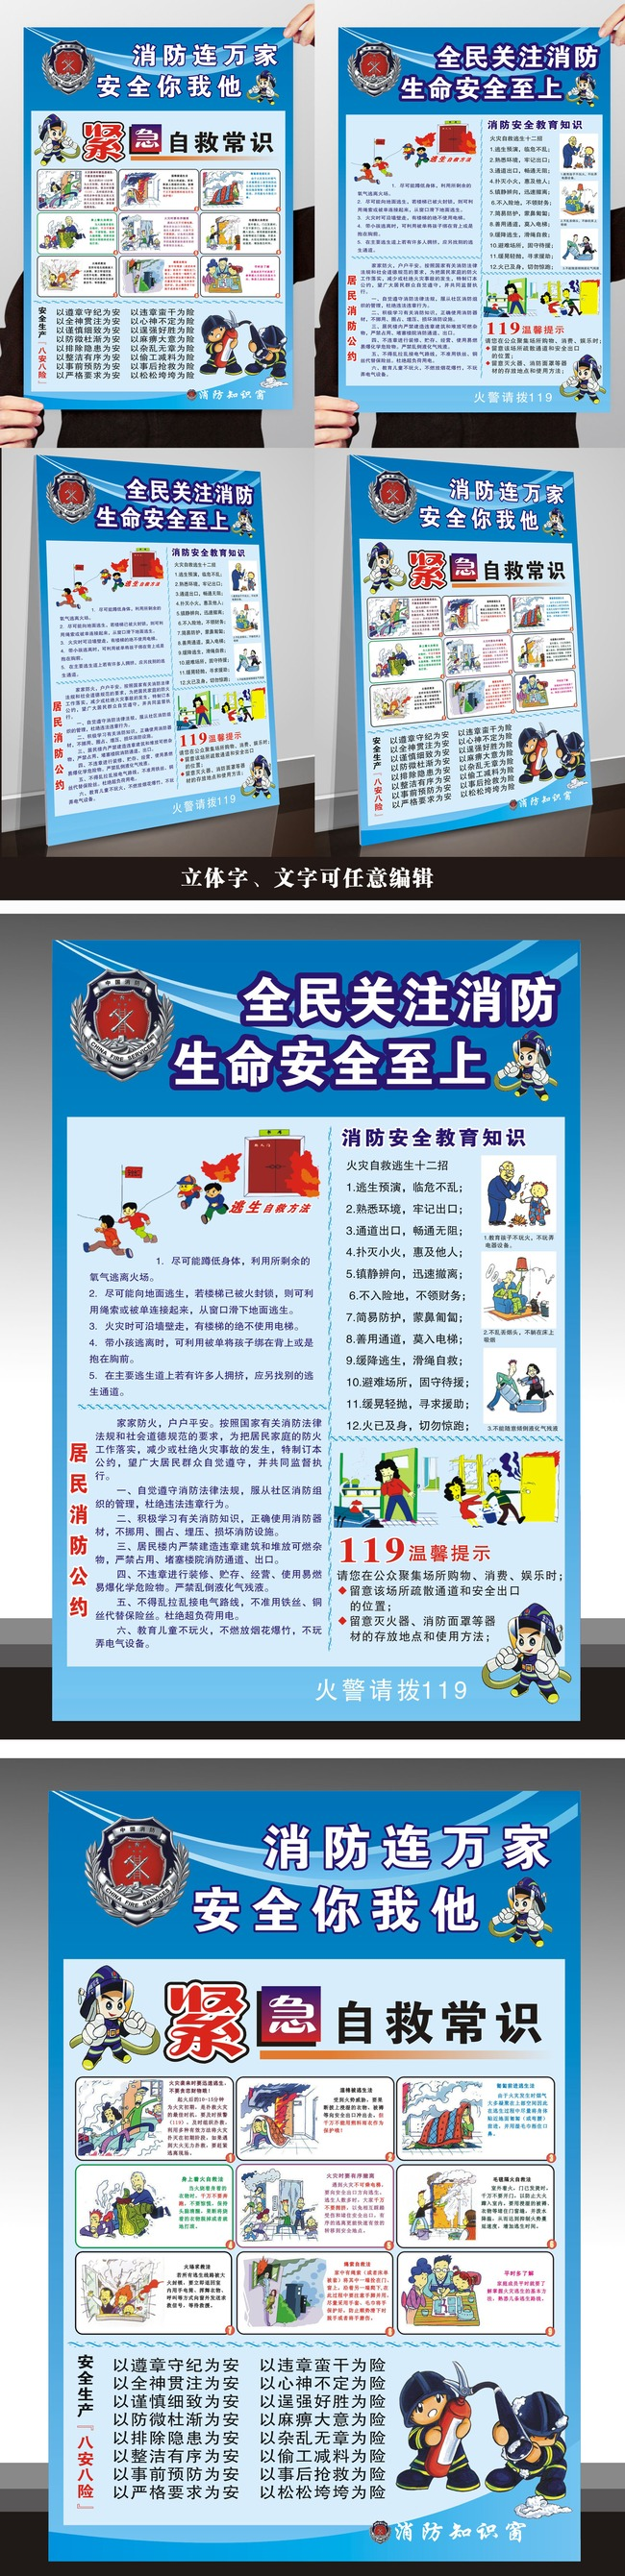 【cdr】消防安全知识展板海报